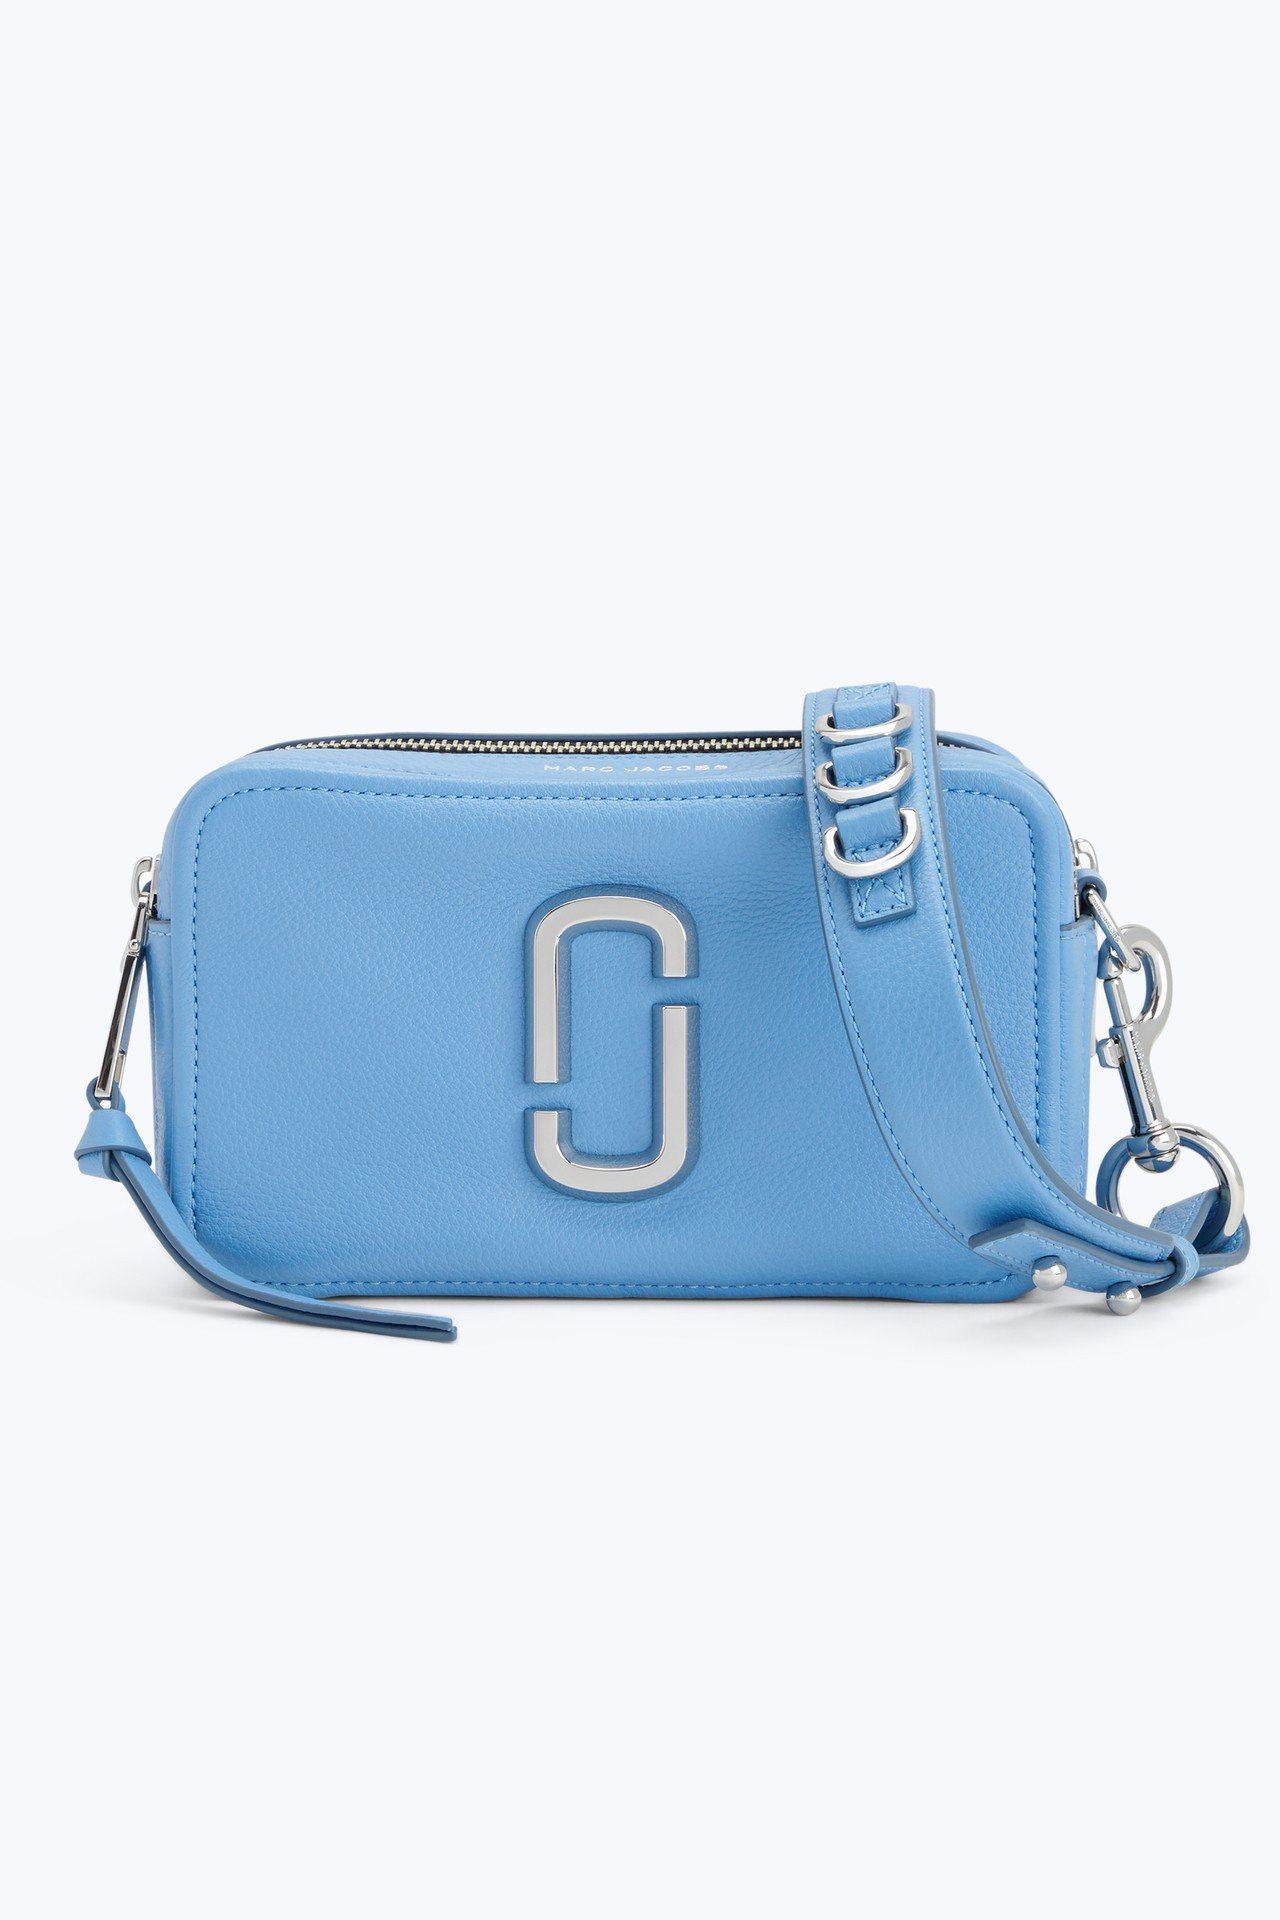 丹寧藍Softshot包,15,900元。圖/Marc Jacobs提供